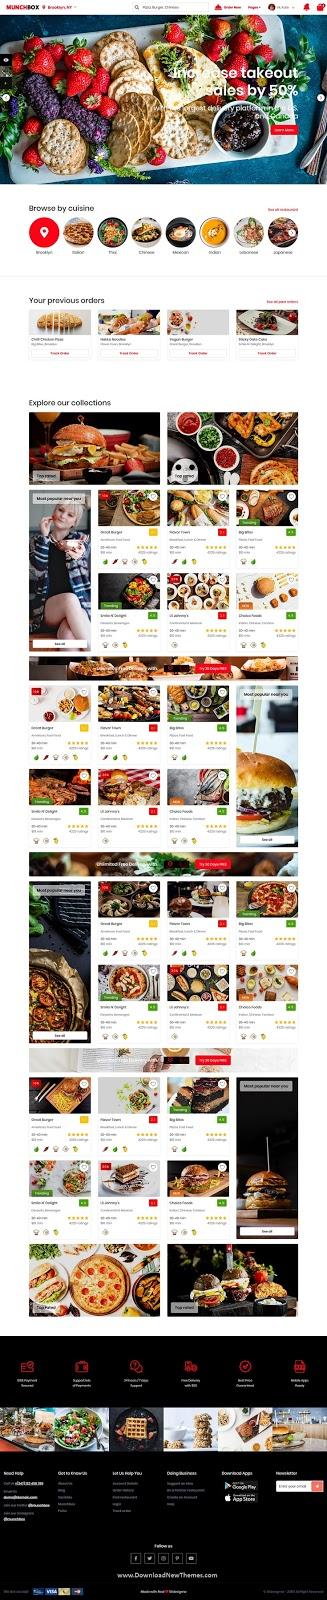 Best Restaurant Listing HTML Template